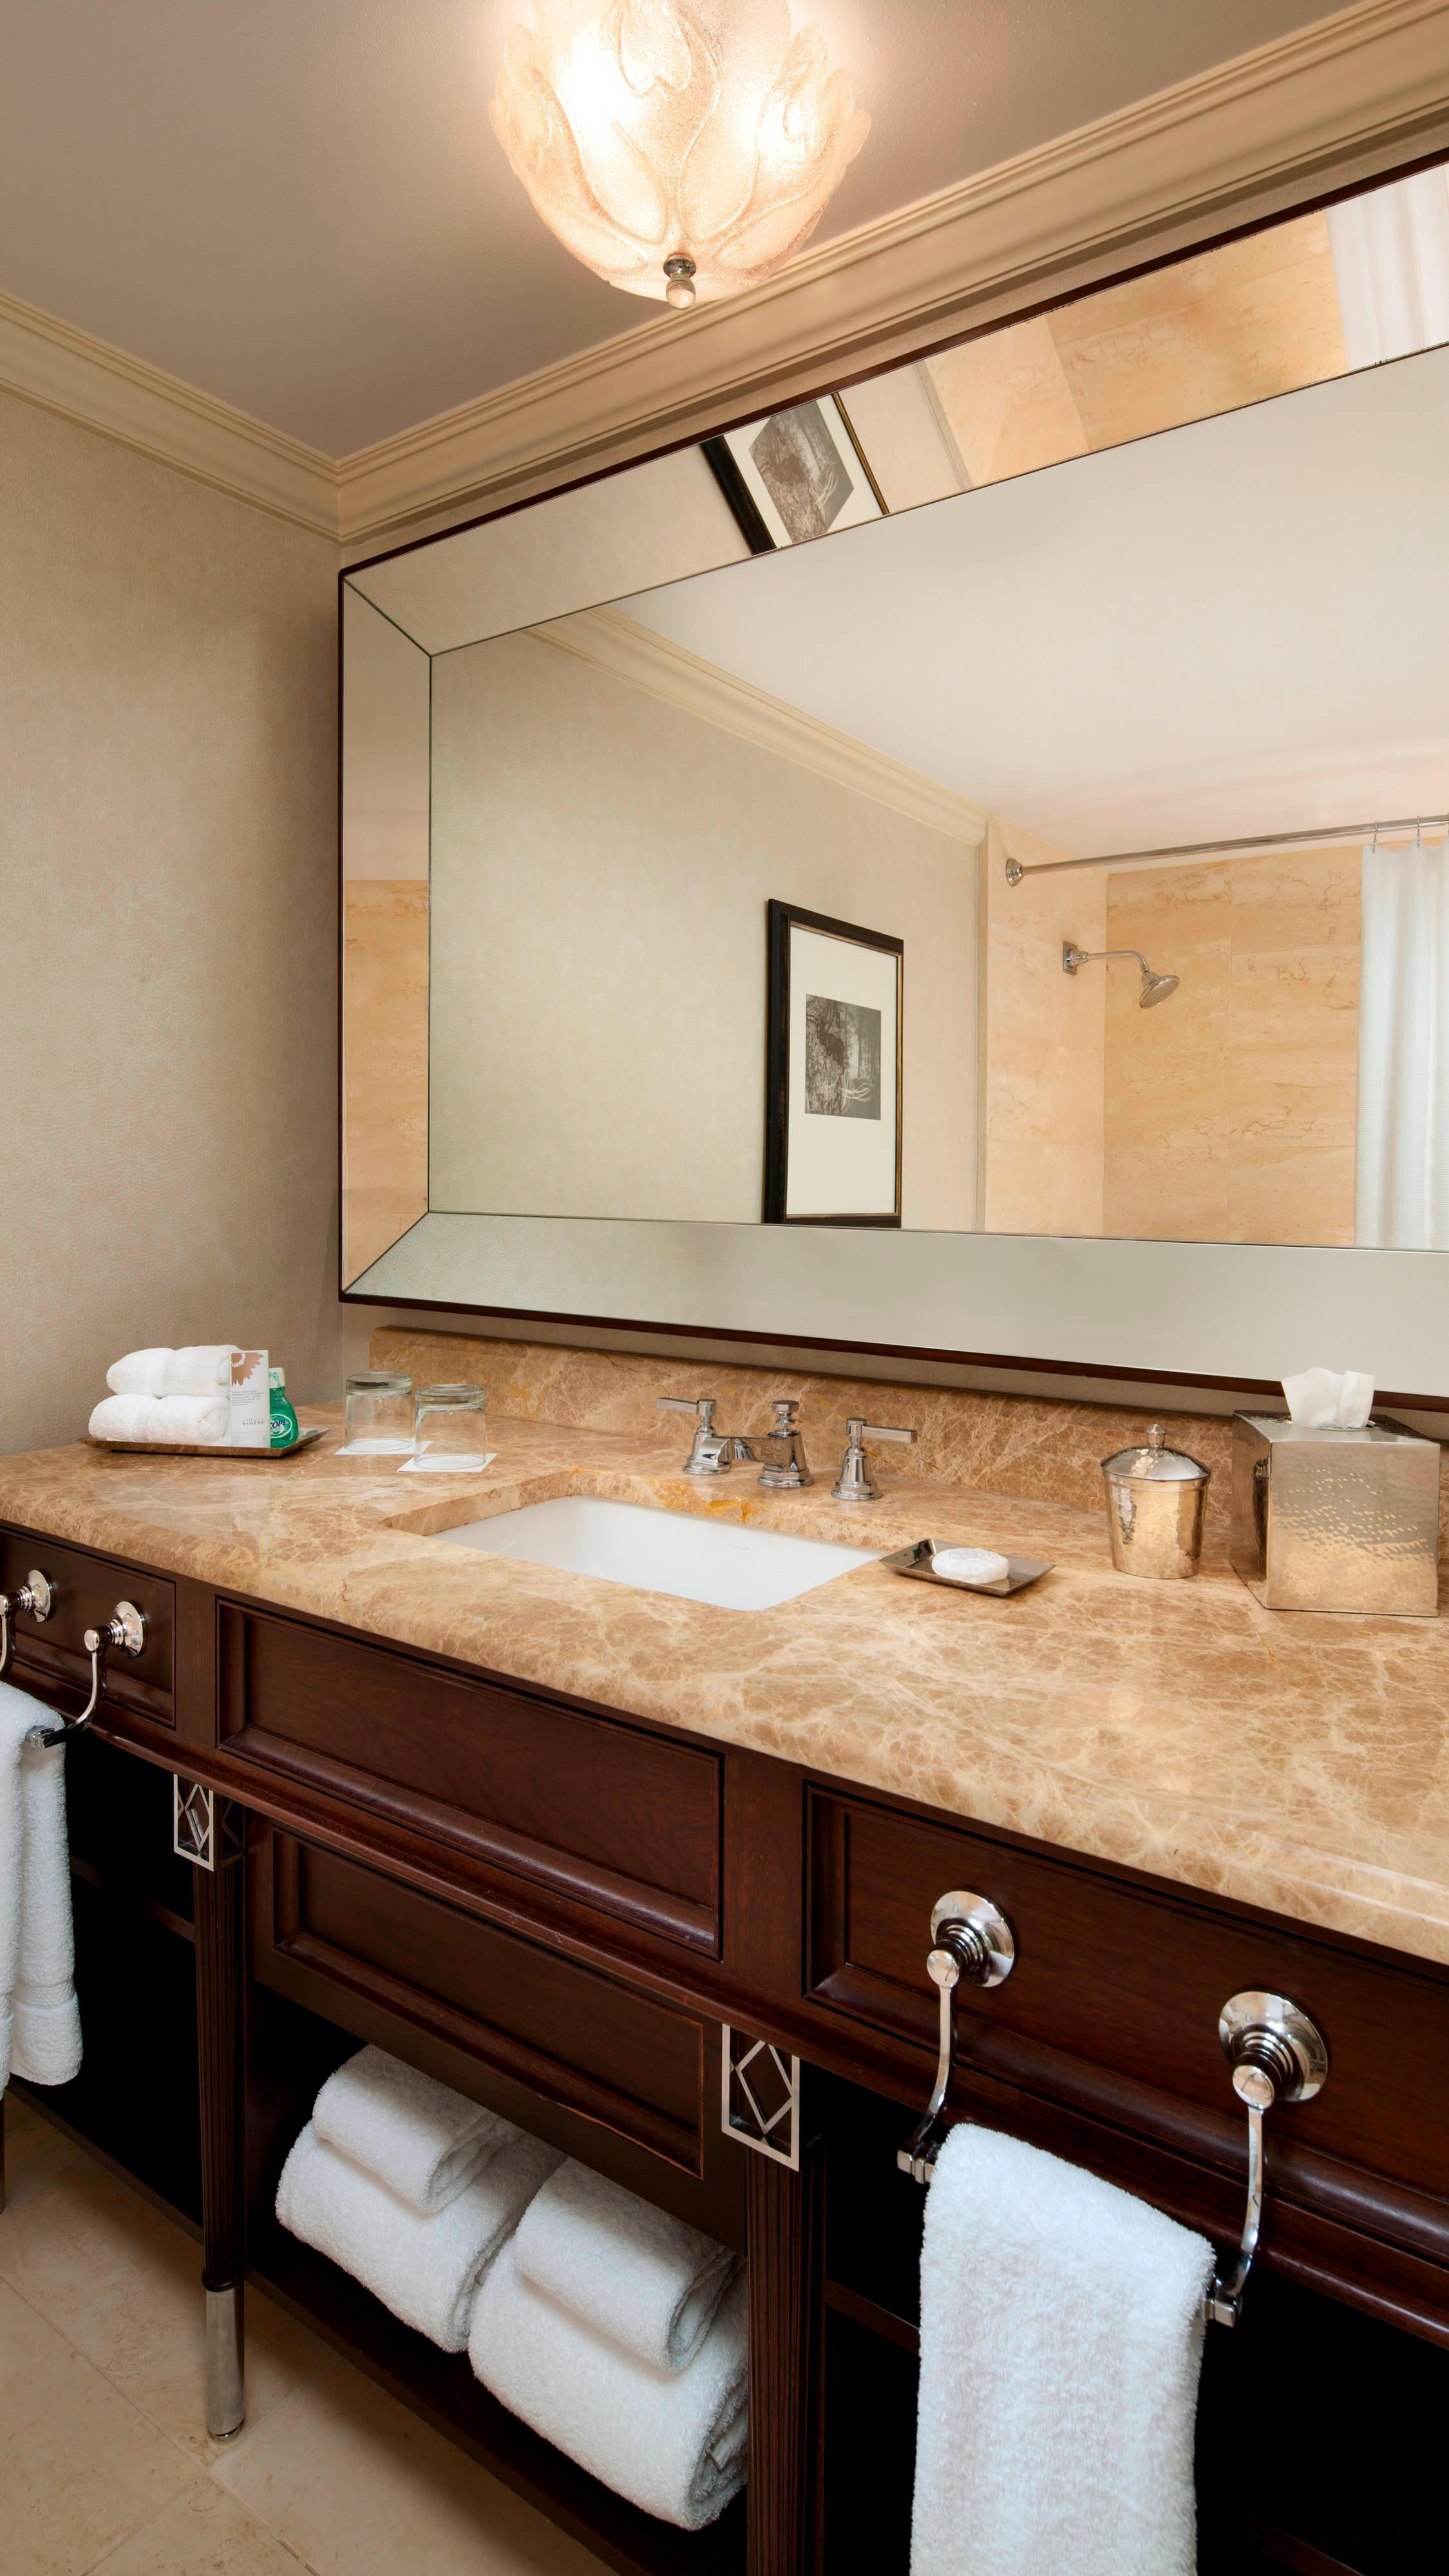 Superior - Deluxe Room Bathroom